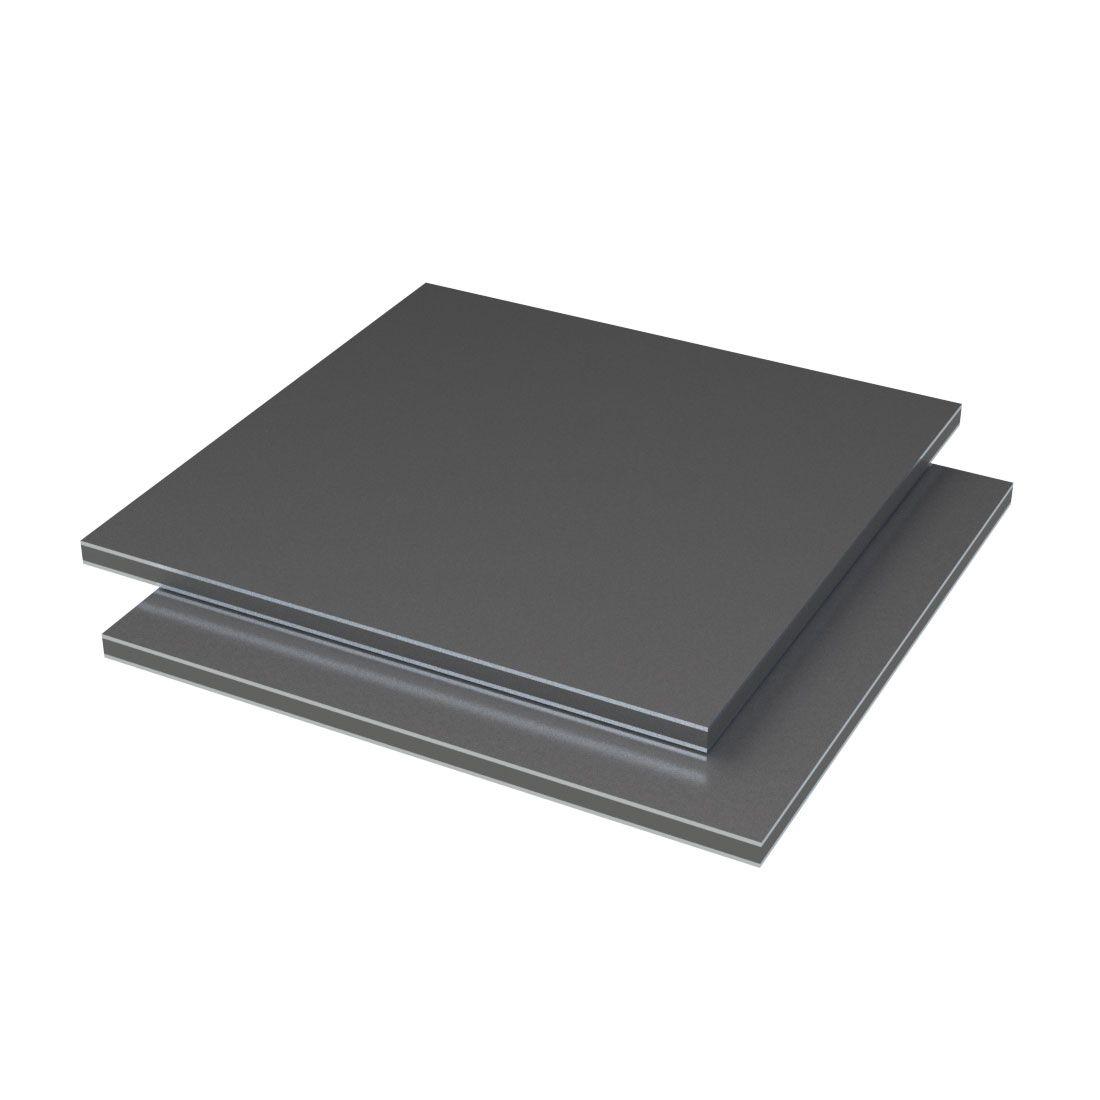 Etalbond Aluminium /PE FR Antraciet 428 4050x1500x4mm Vhdpe gecoat